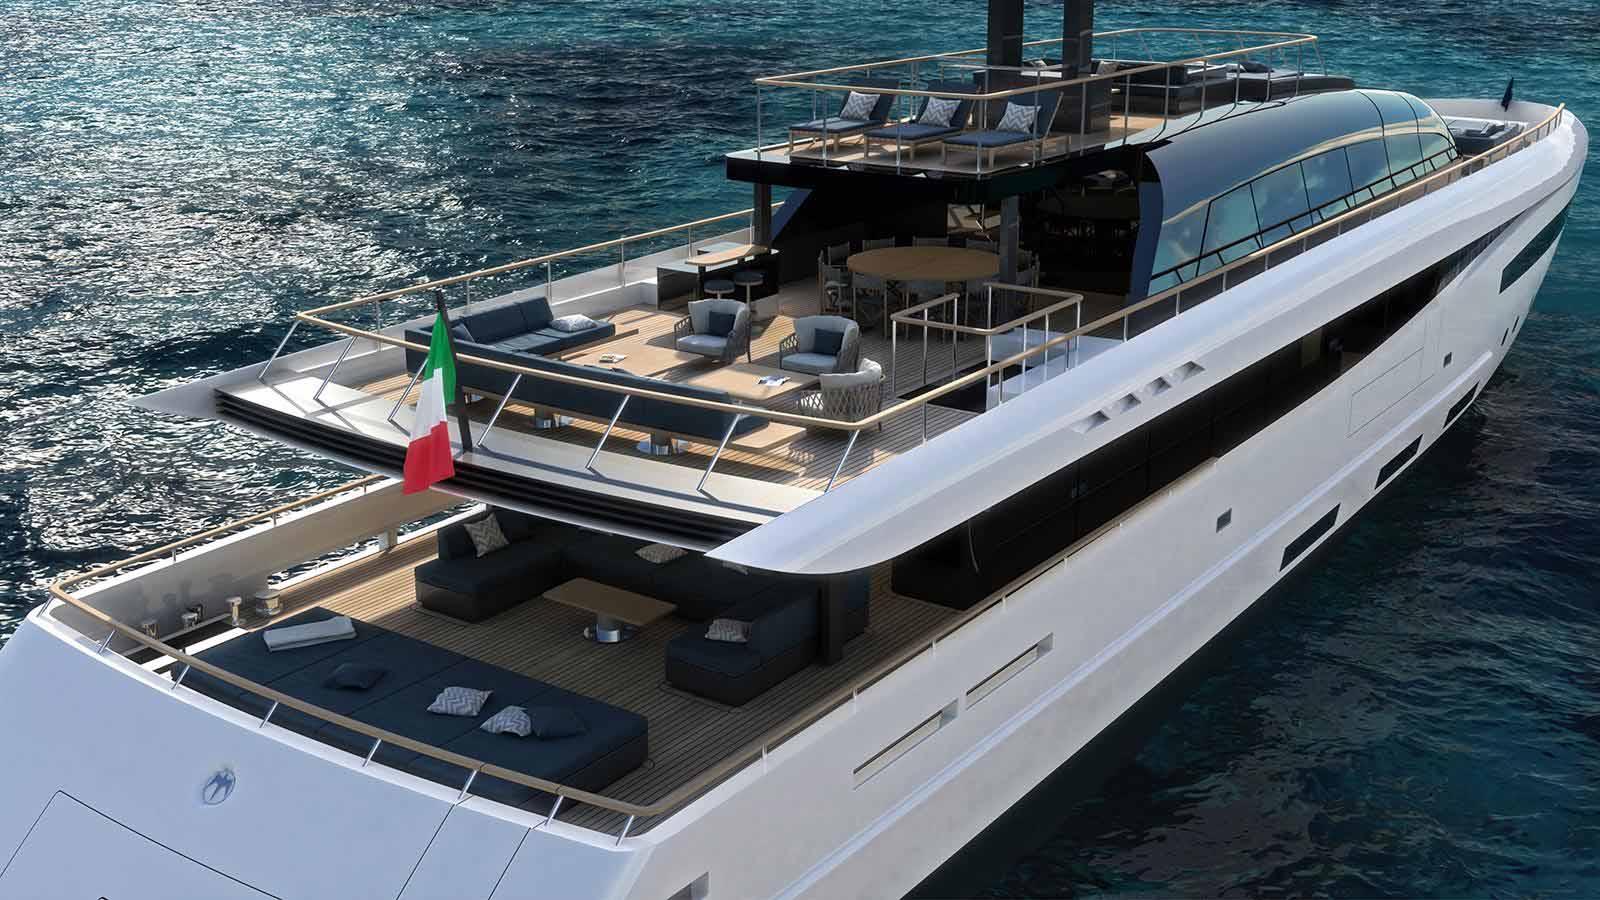 Baglietto-revela-conceito-de-50-metros-Santa-Maria-Magnolfi-boatshopping